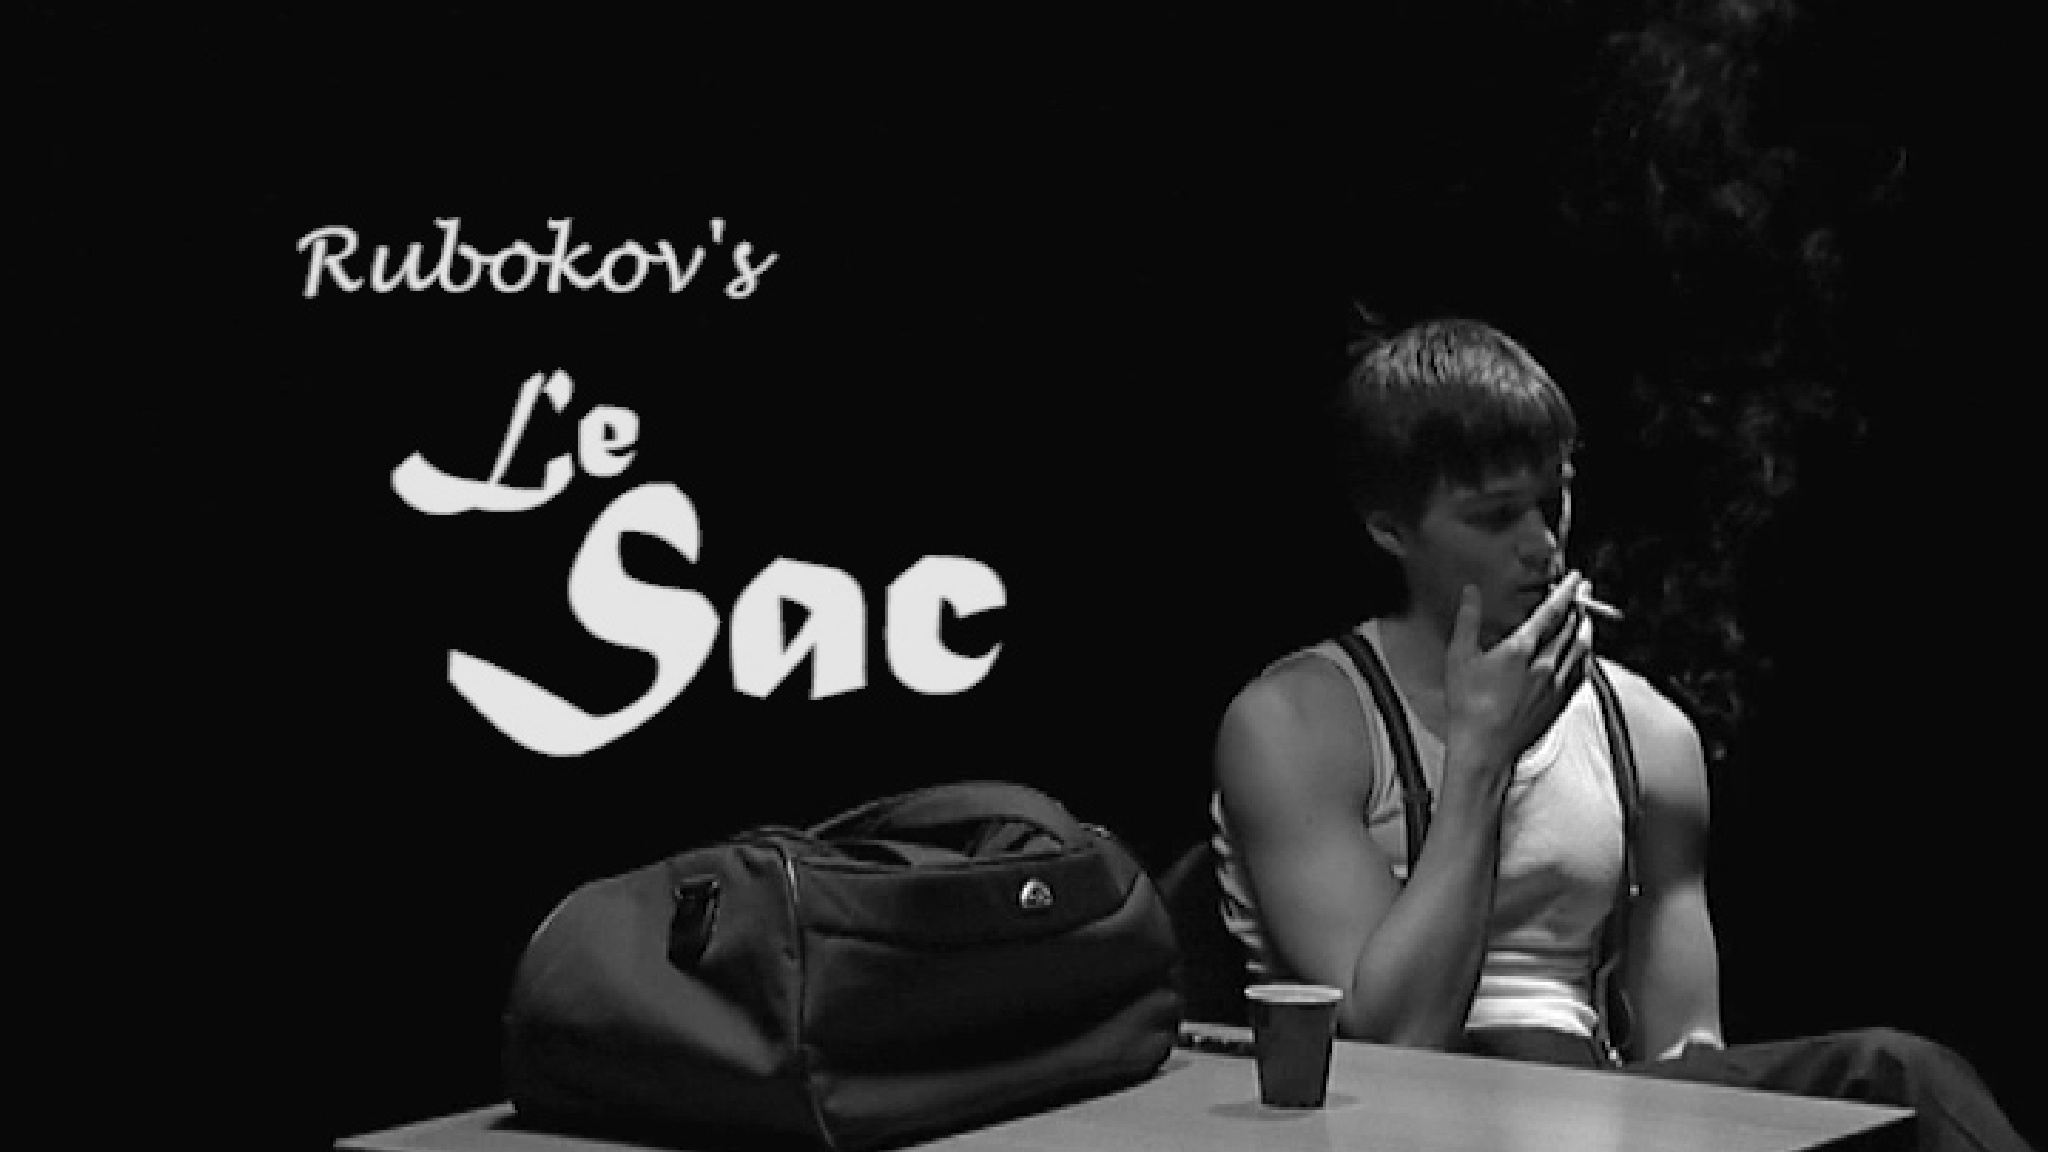 Le Sac (shortfilm) by Marcus Holmqvist